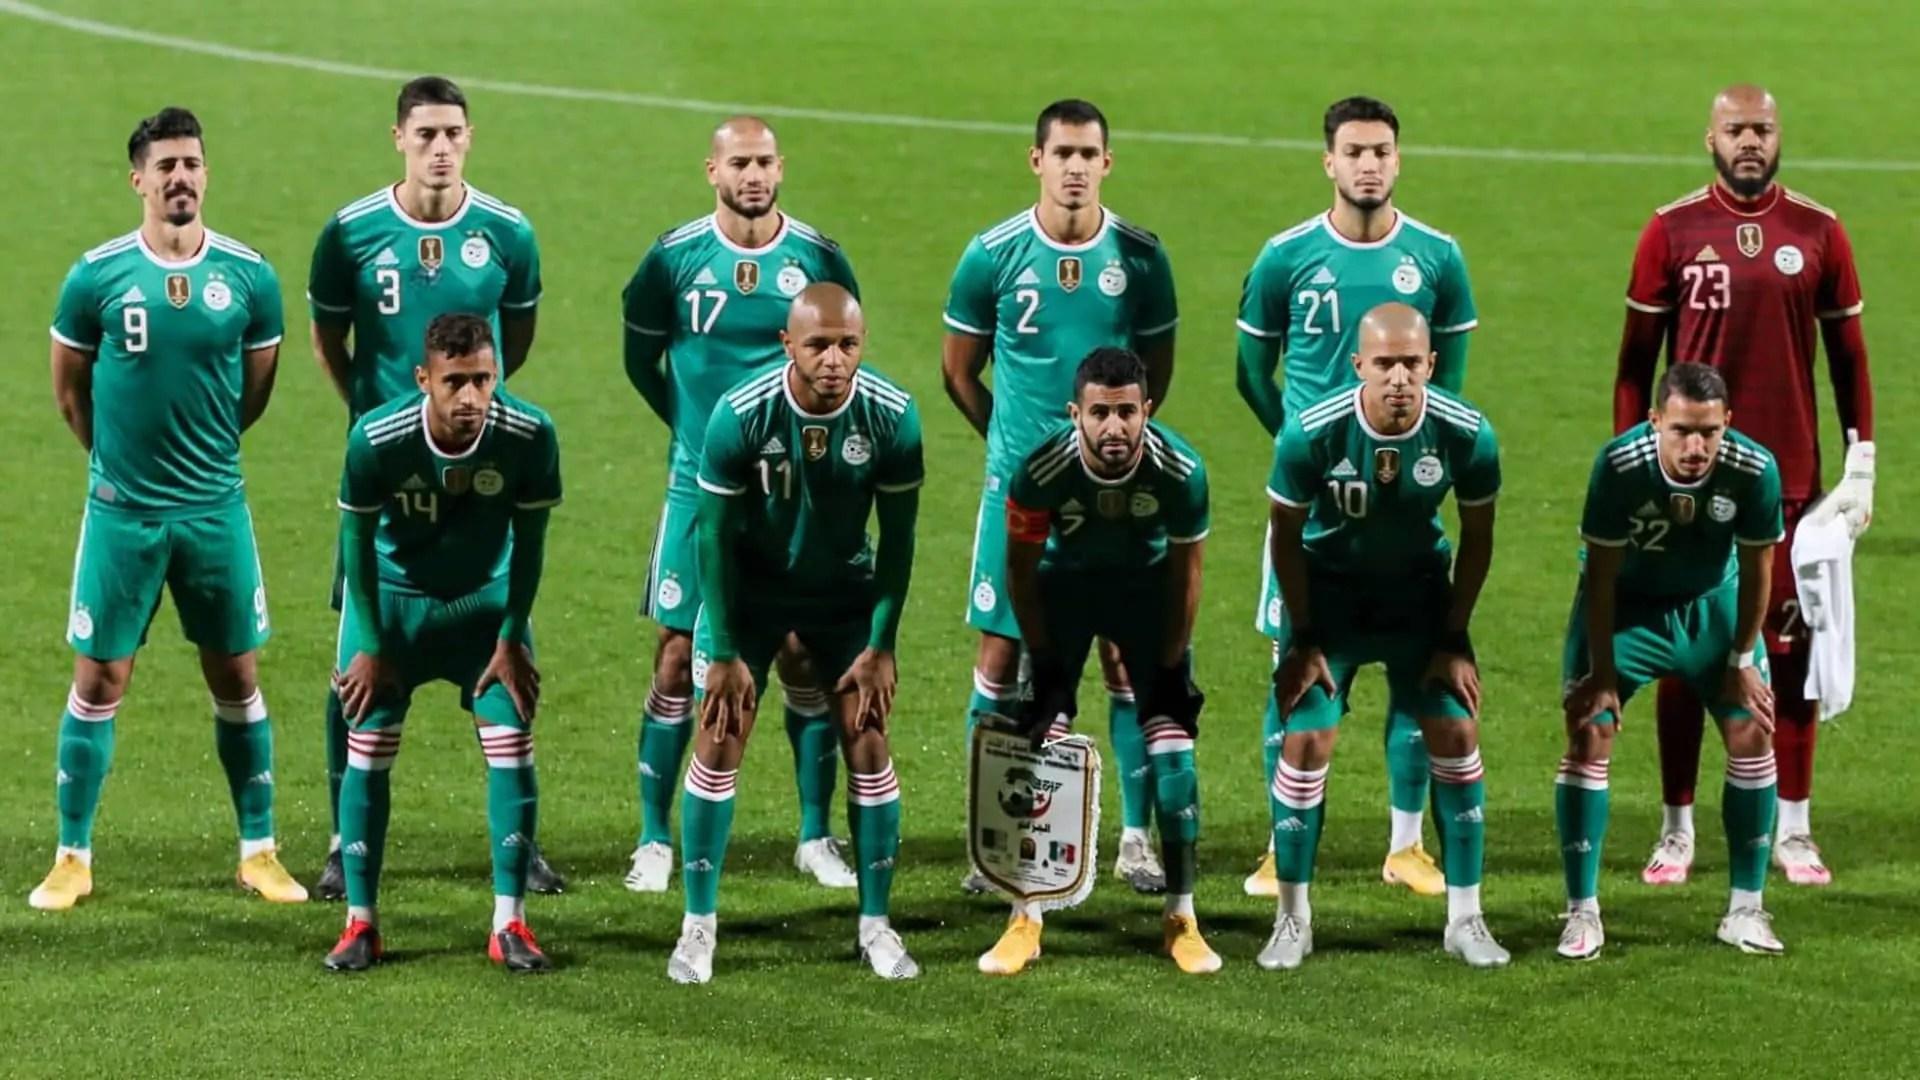 Calendrier Coupe Du Monde 2021 Foot – Calendrier 2021